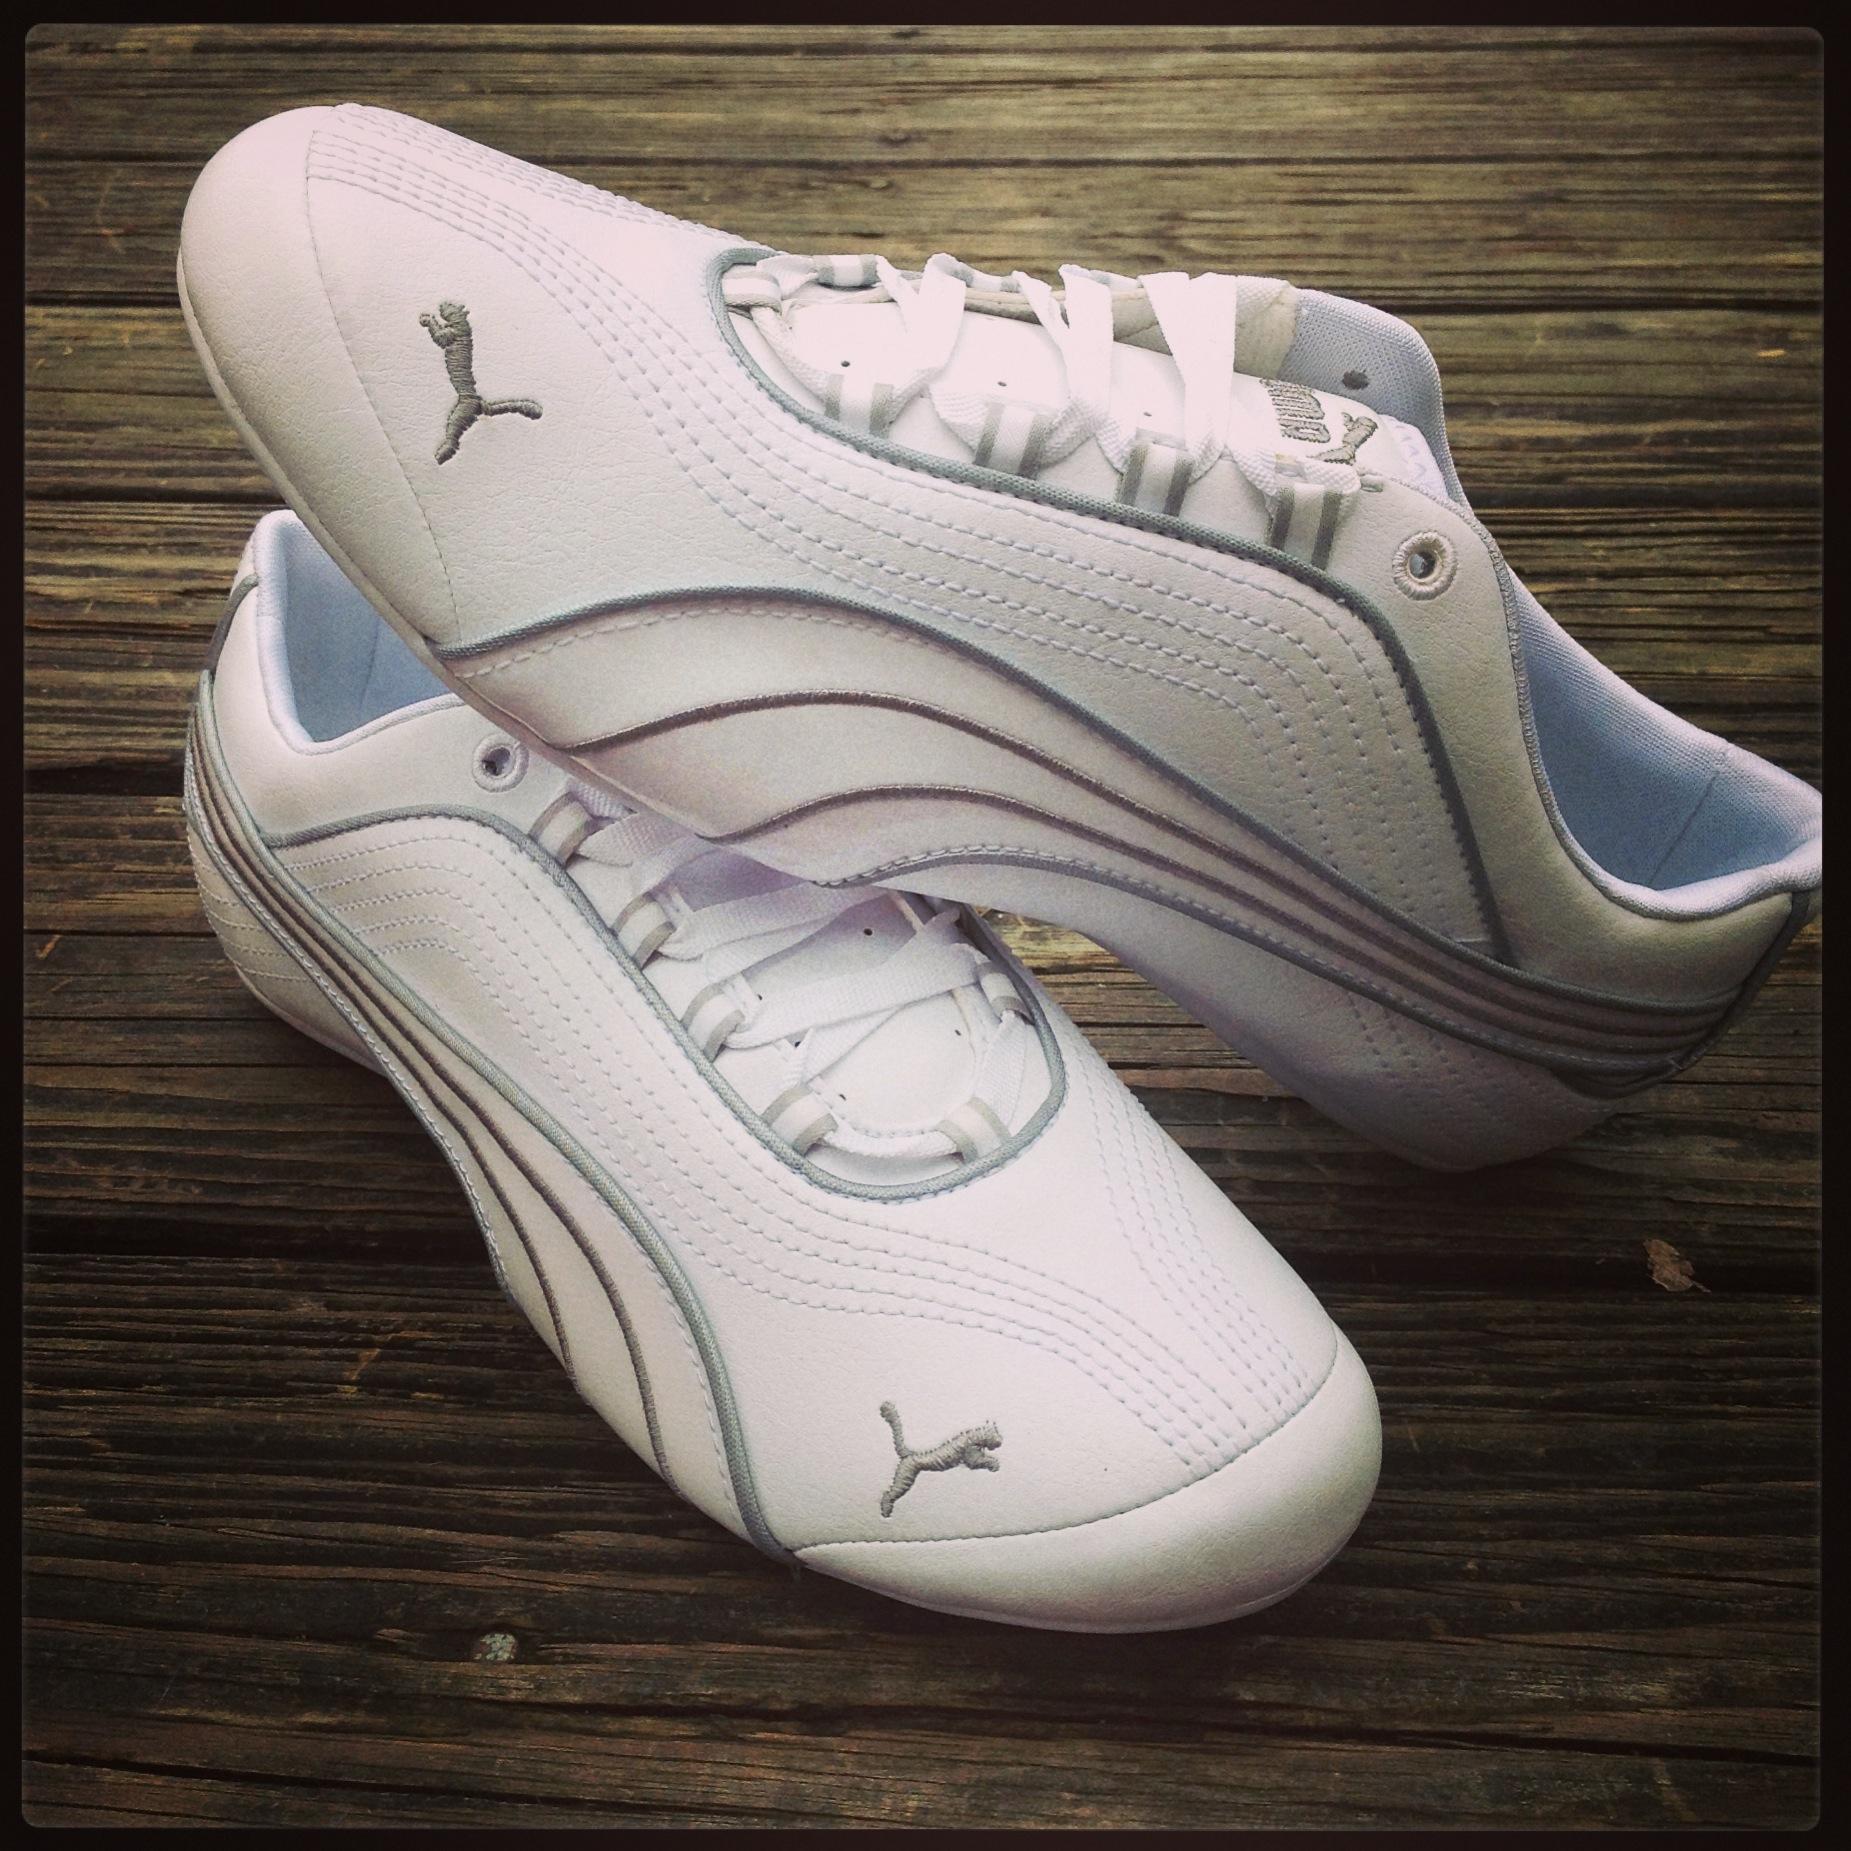 PUMA Soleil FS Women's Shoe